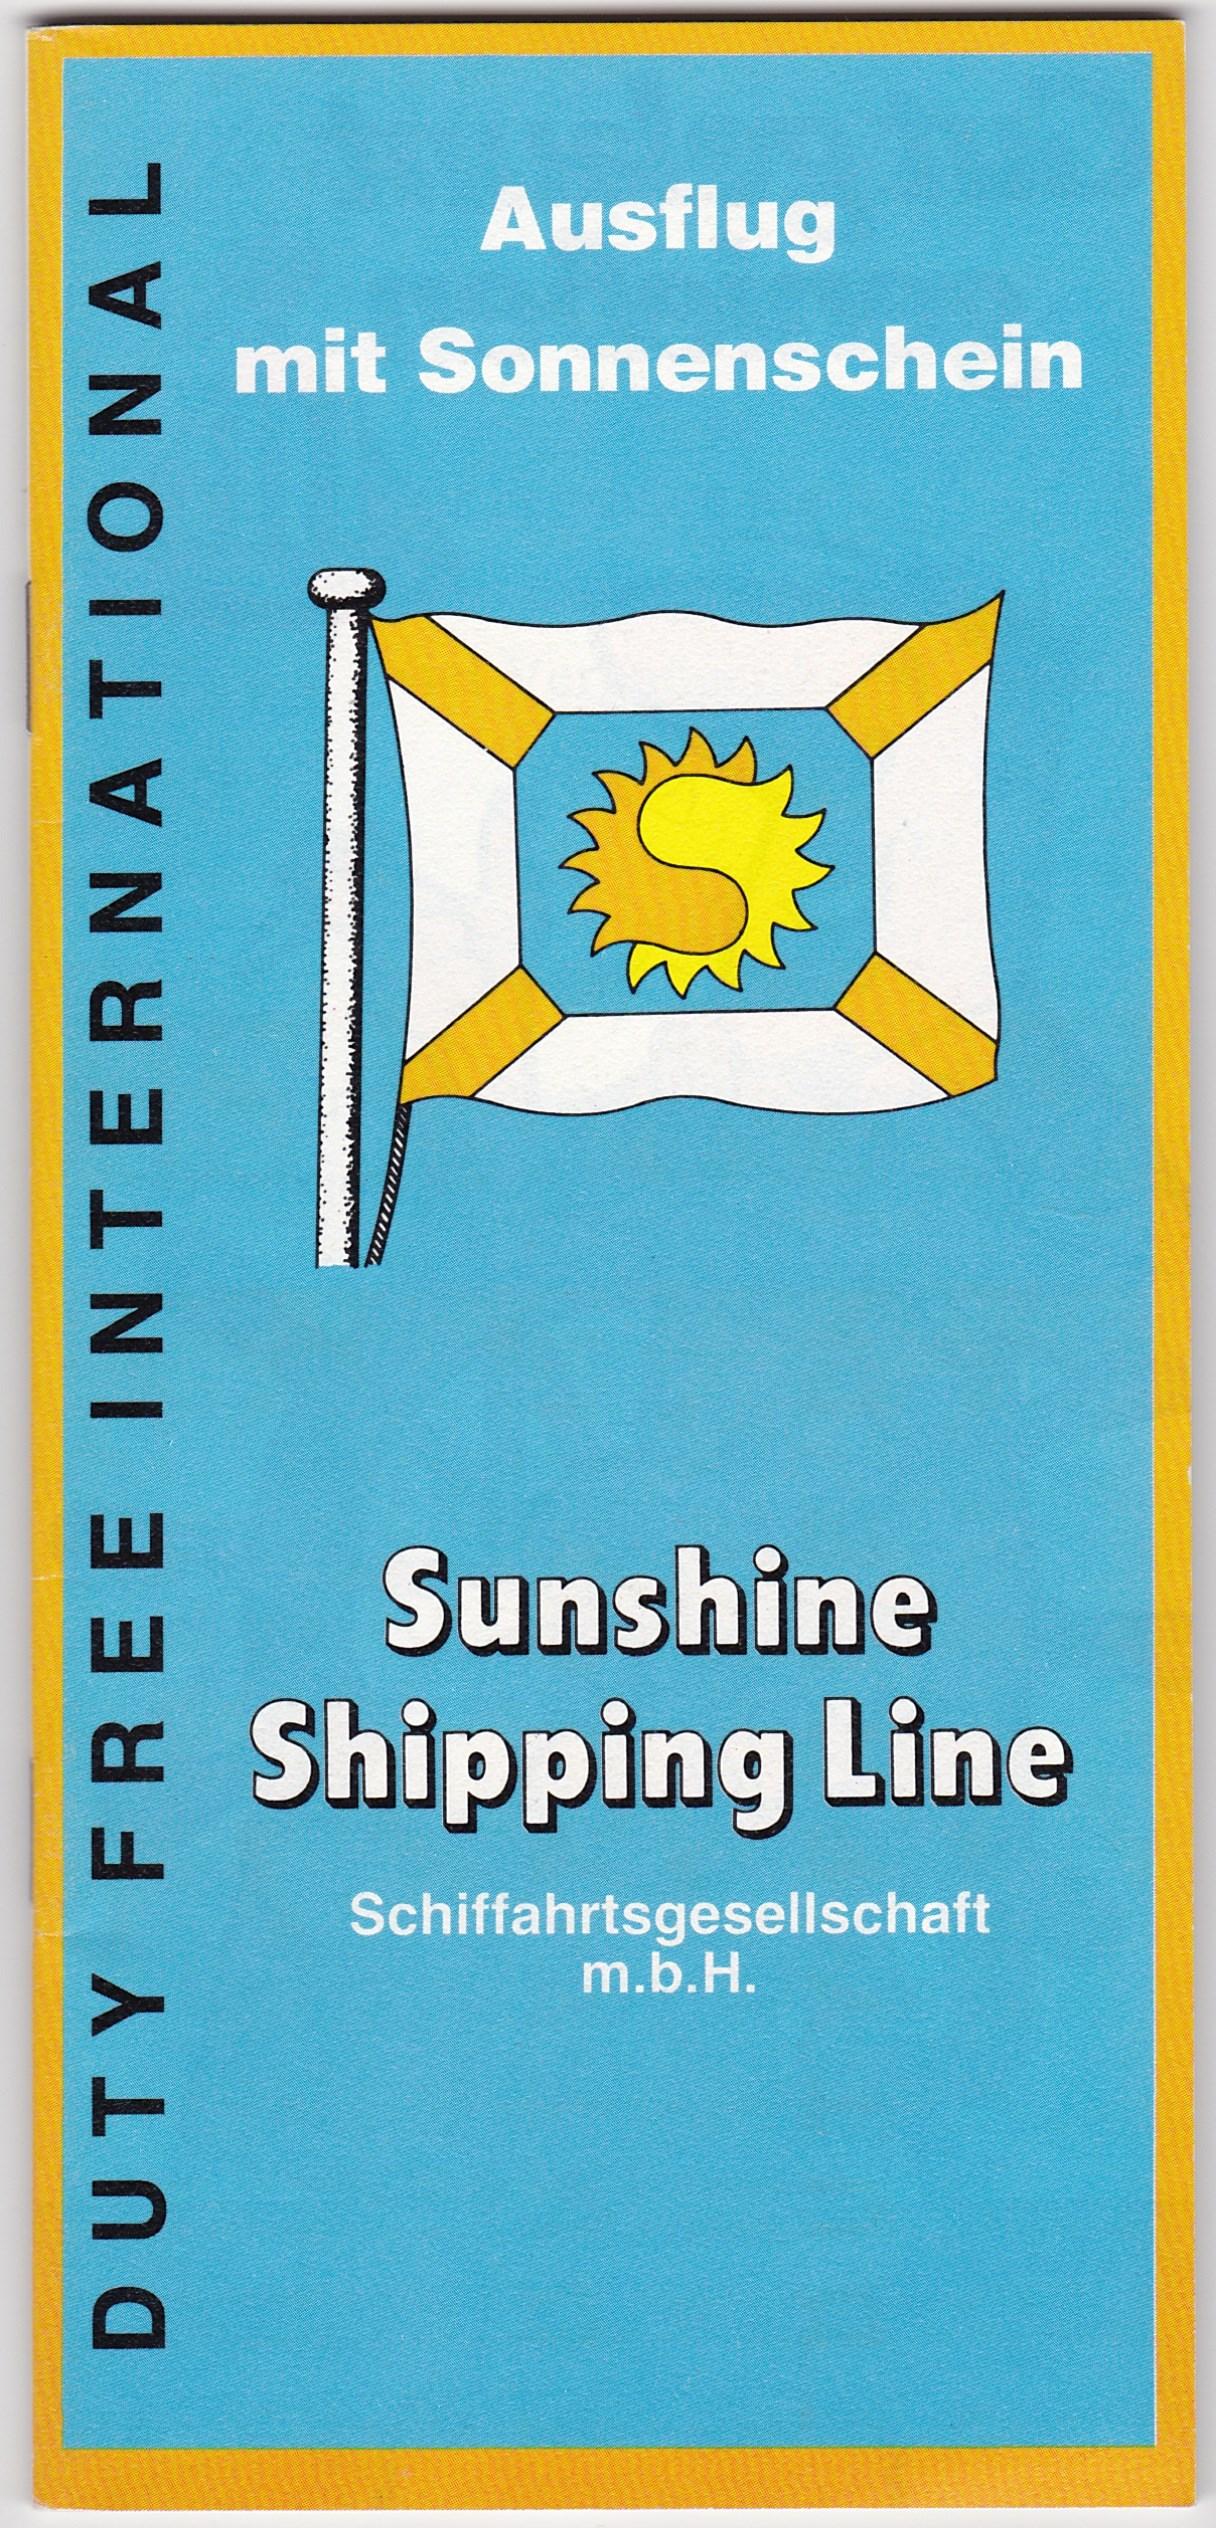 Warenprospekt Sunshine Shipping Line 1980er Jahre